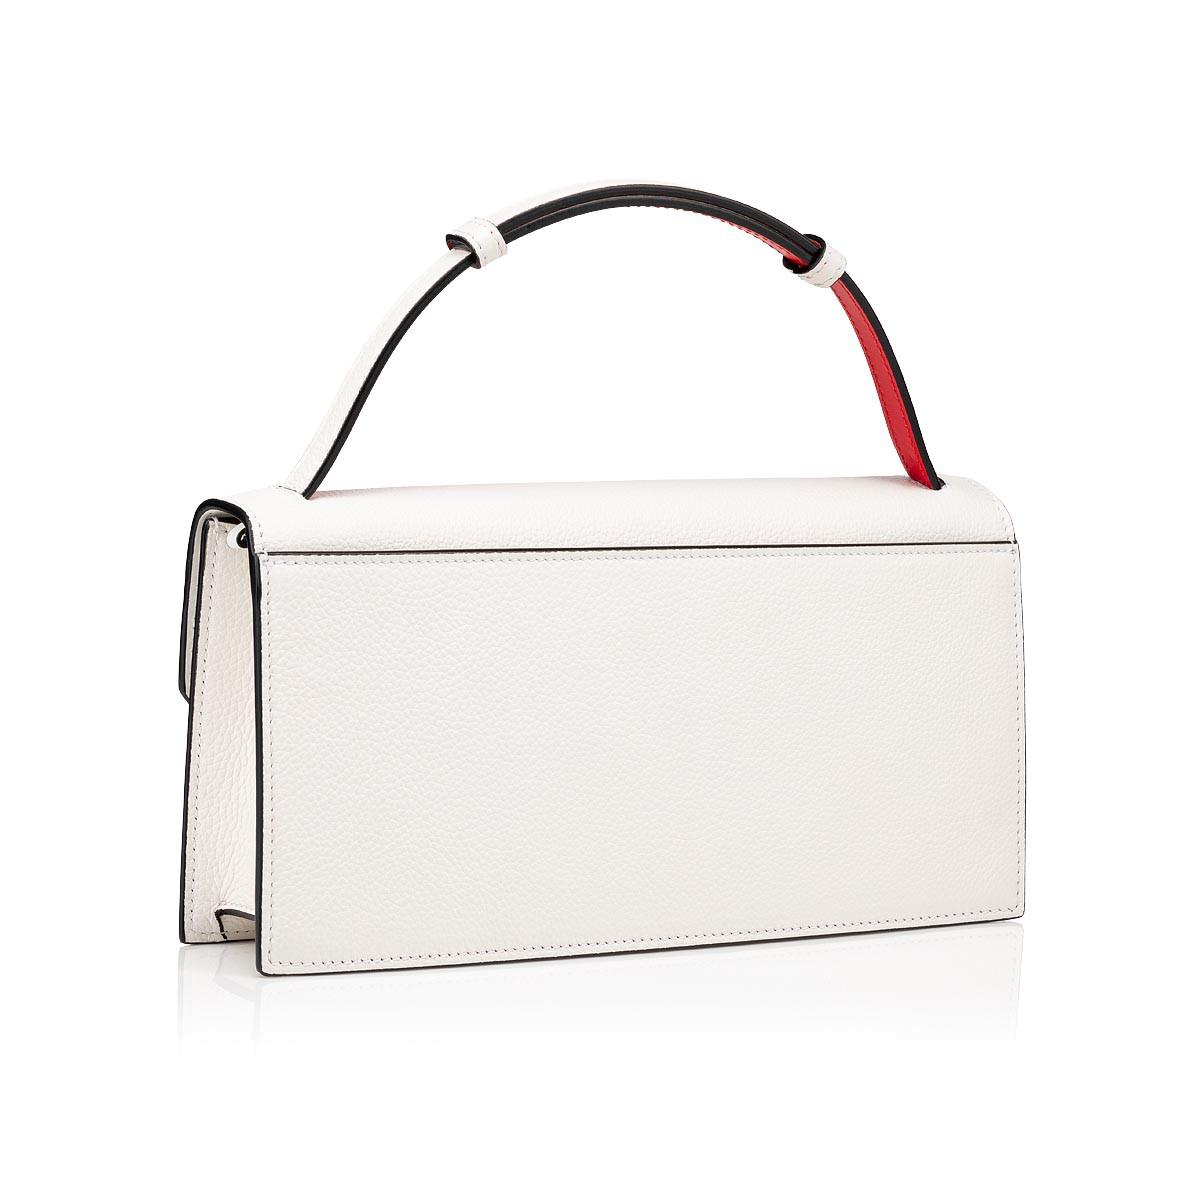 Bags - Elisa Baguette Classic Leather - Christian Louboutin